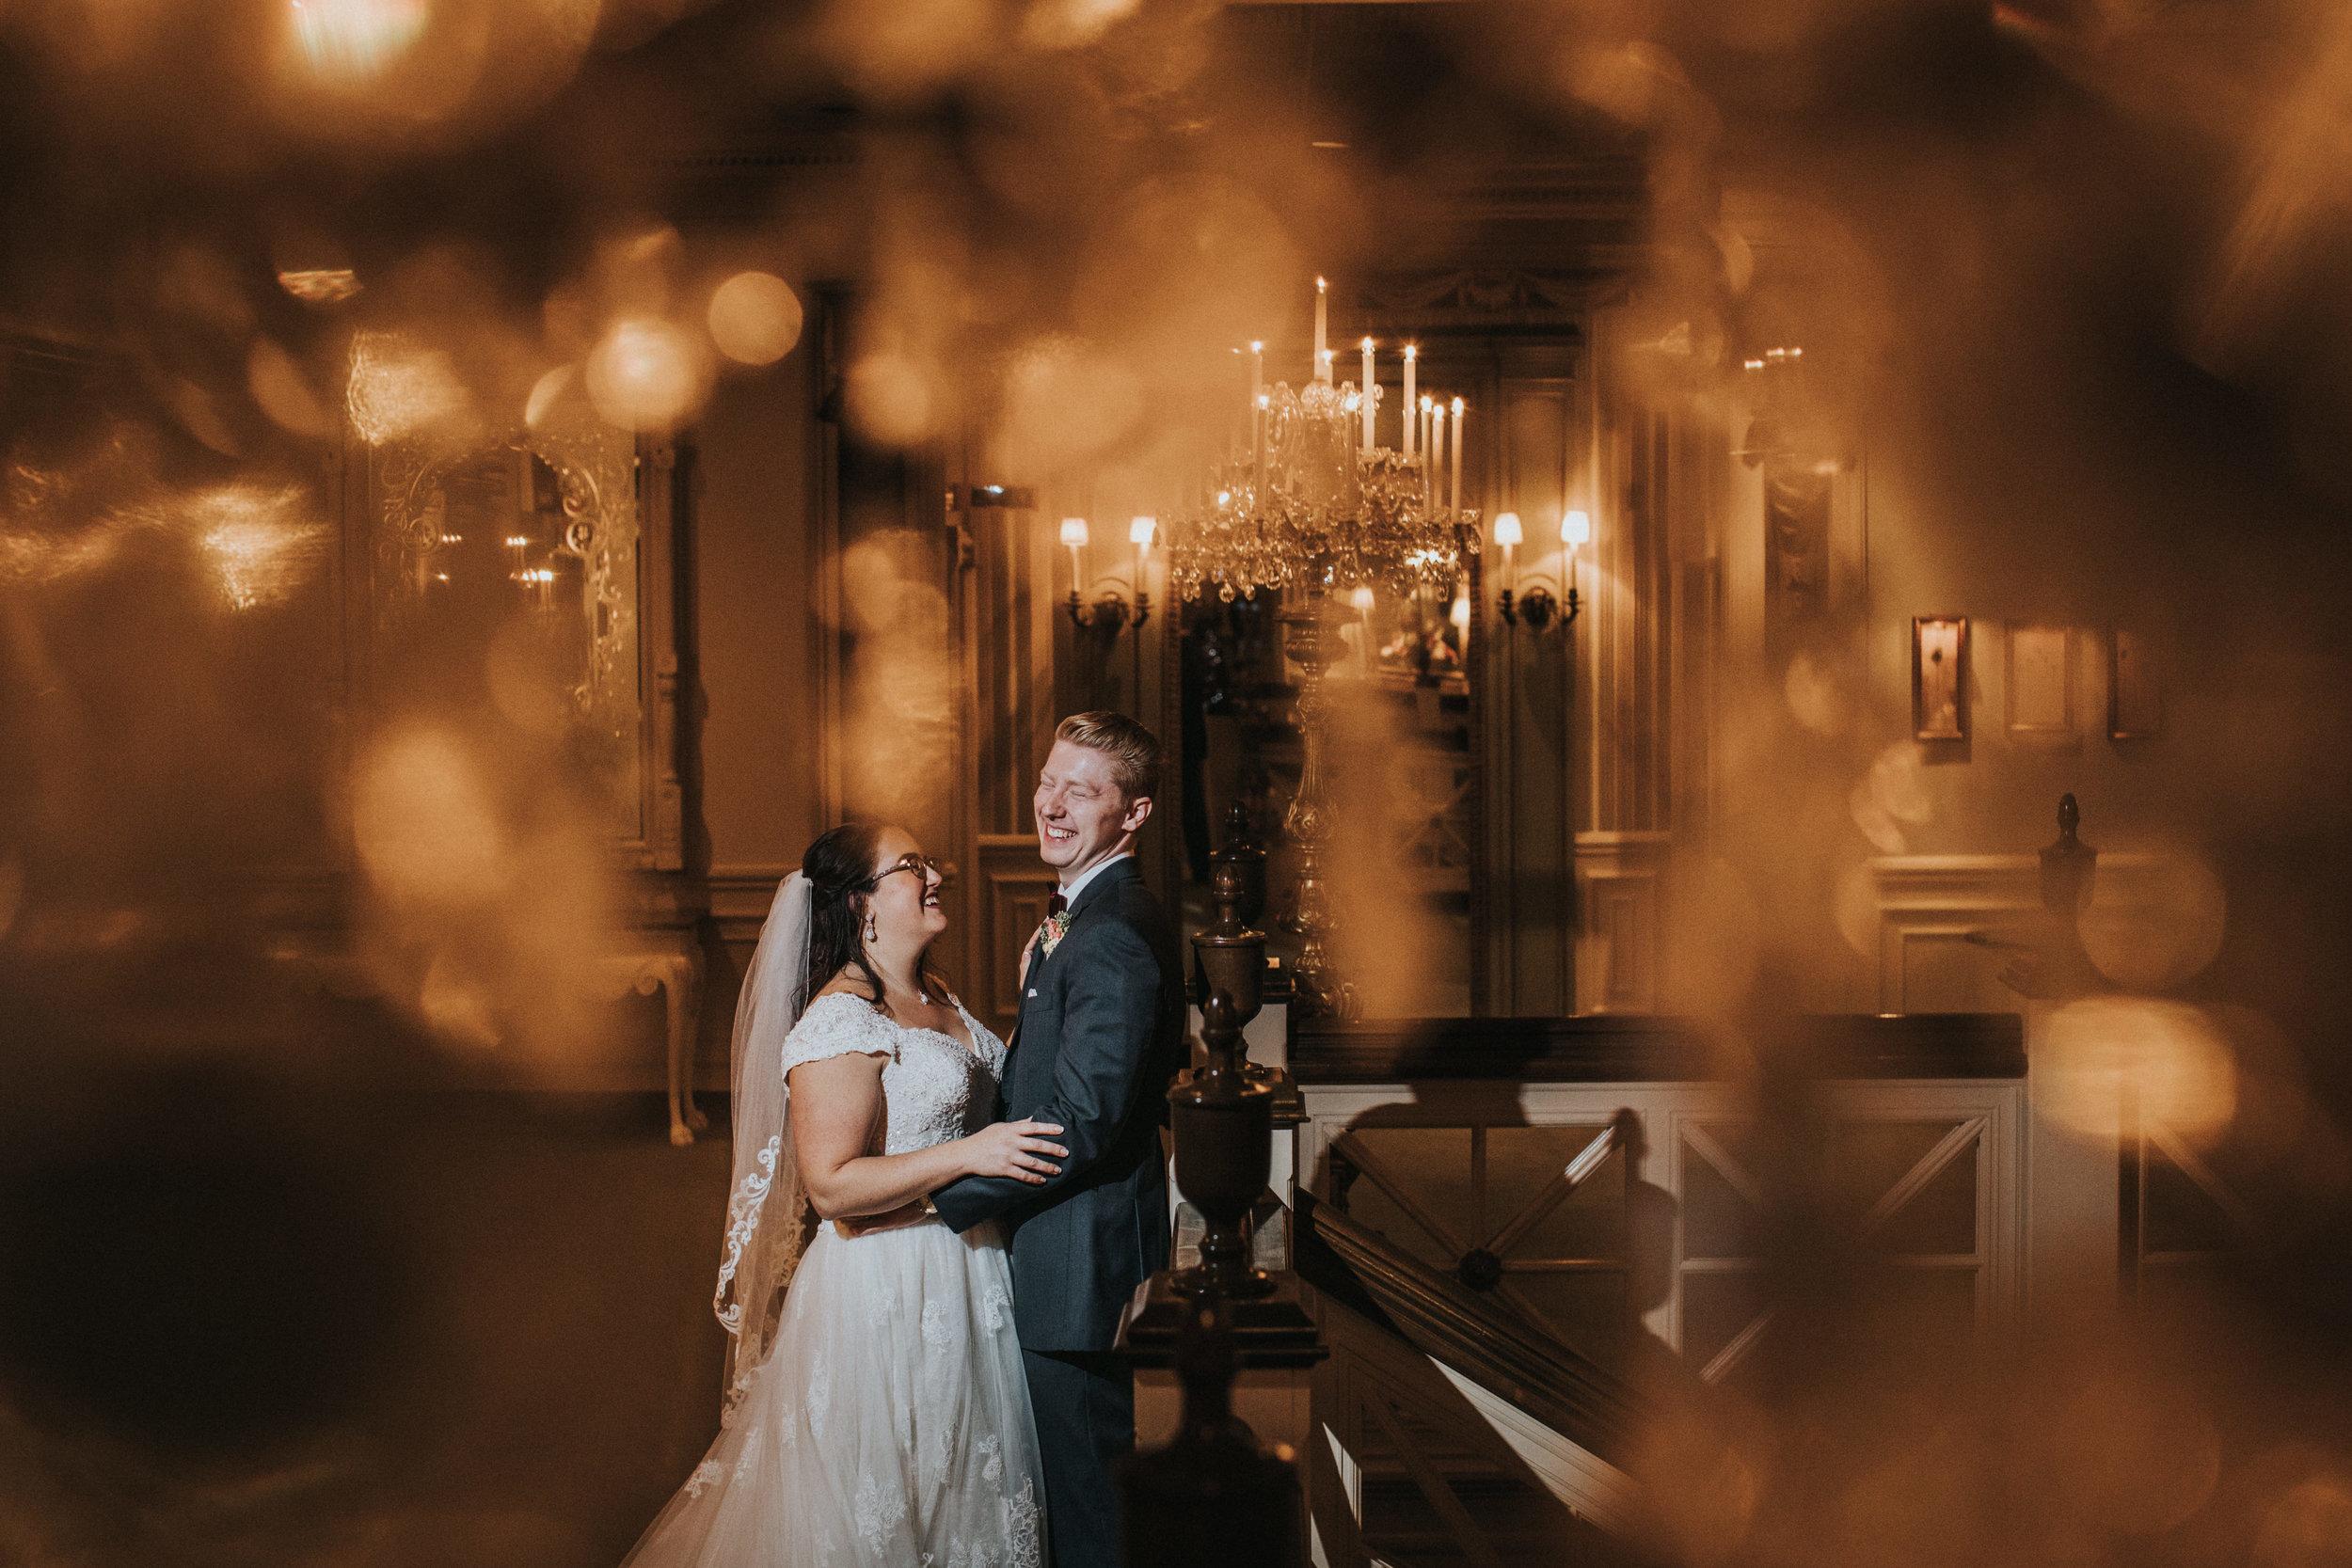 New-Jersey-Wedding-Photography-Fishers-Tudor-House-JennaLynnPhotography-Bride&Groom-Kathleen&Eddie-19.jpg